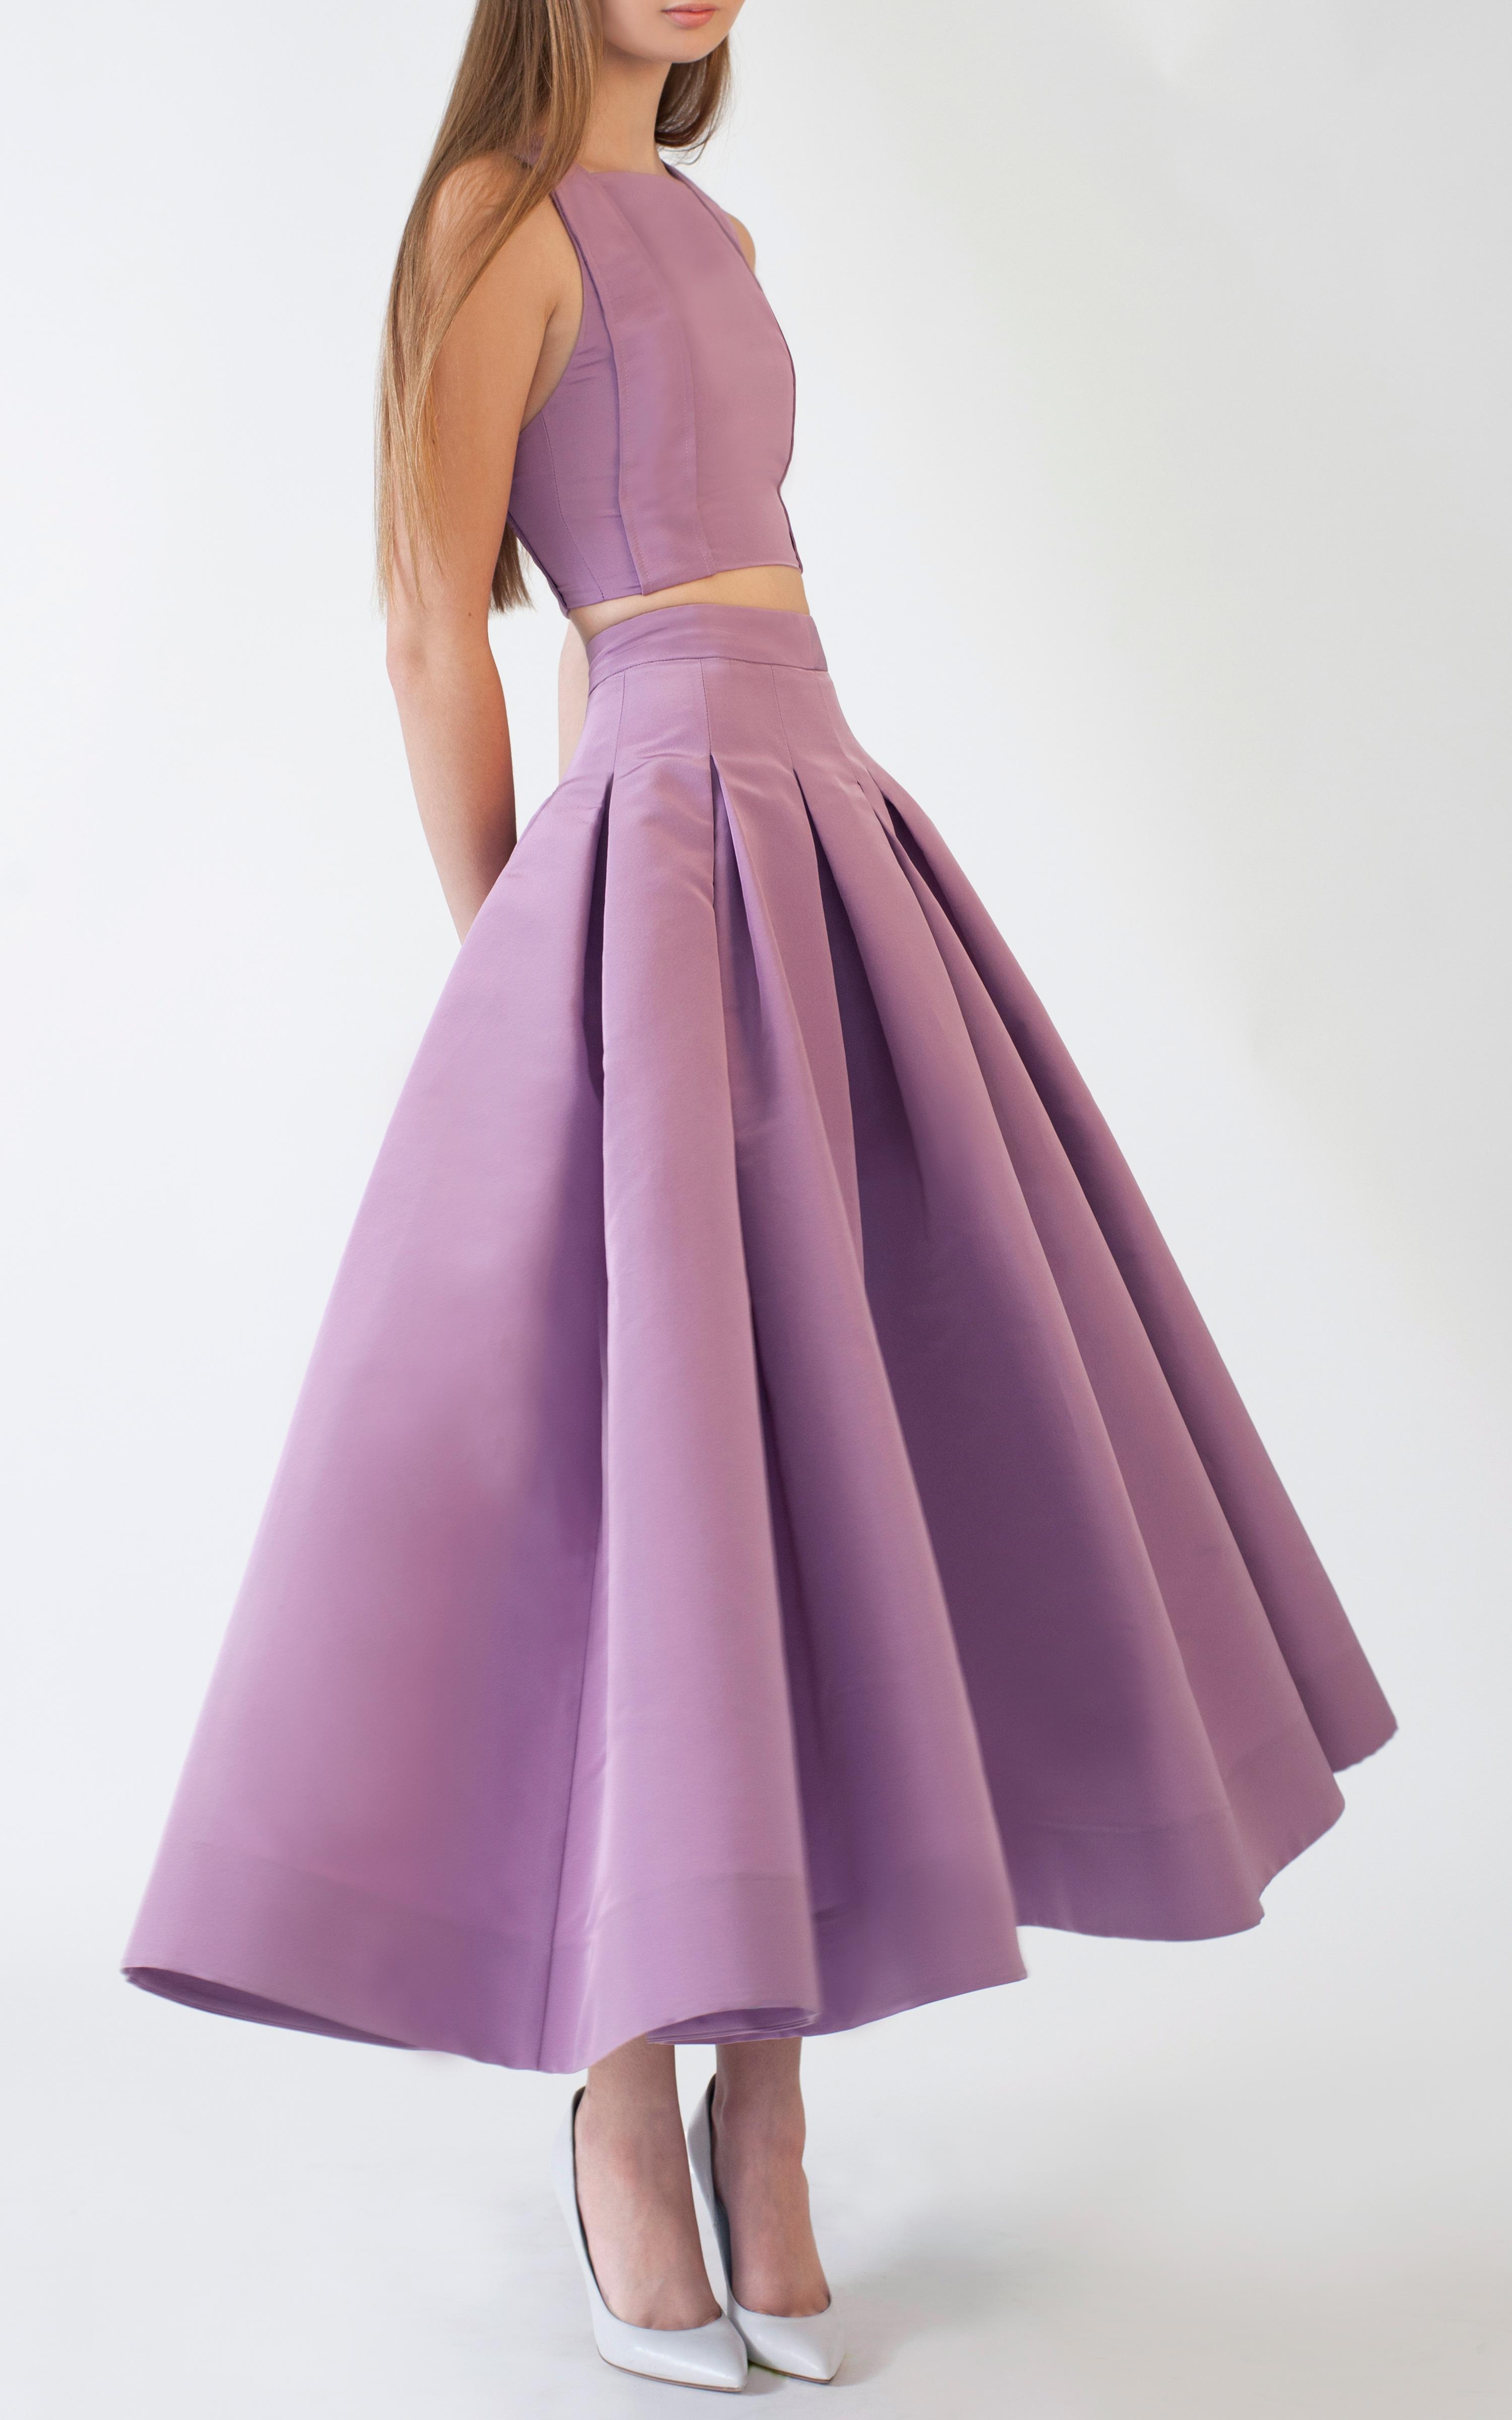 Katie ermilio Box Pleat Swing Skirt in Purple | Lyst Lilac High Heels